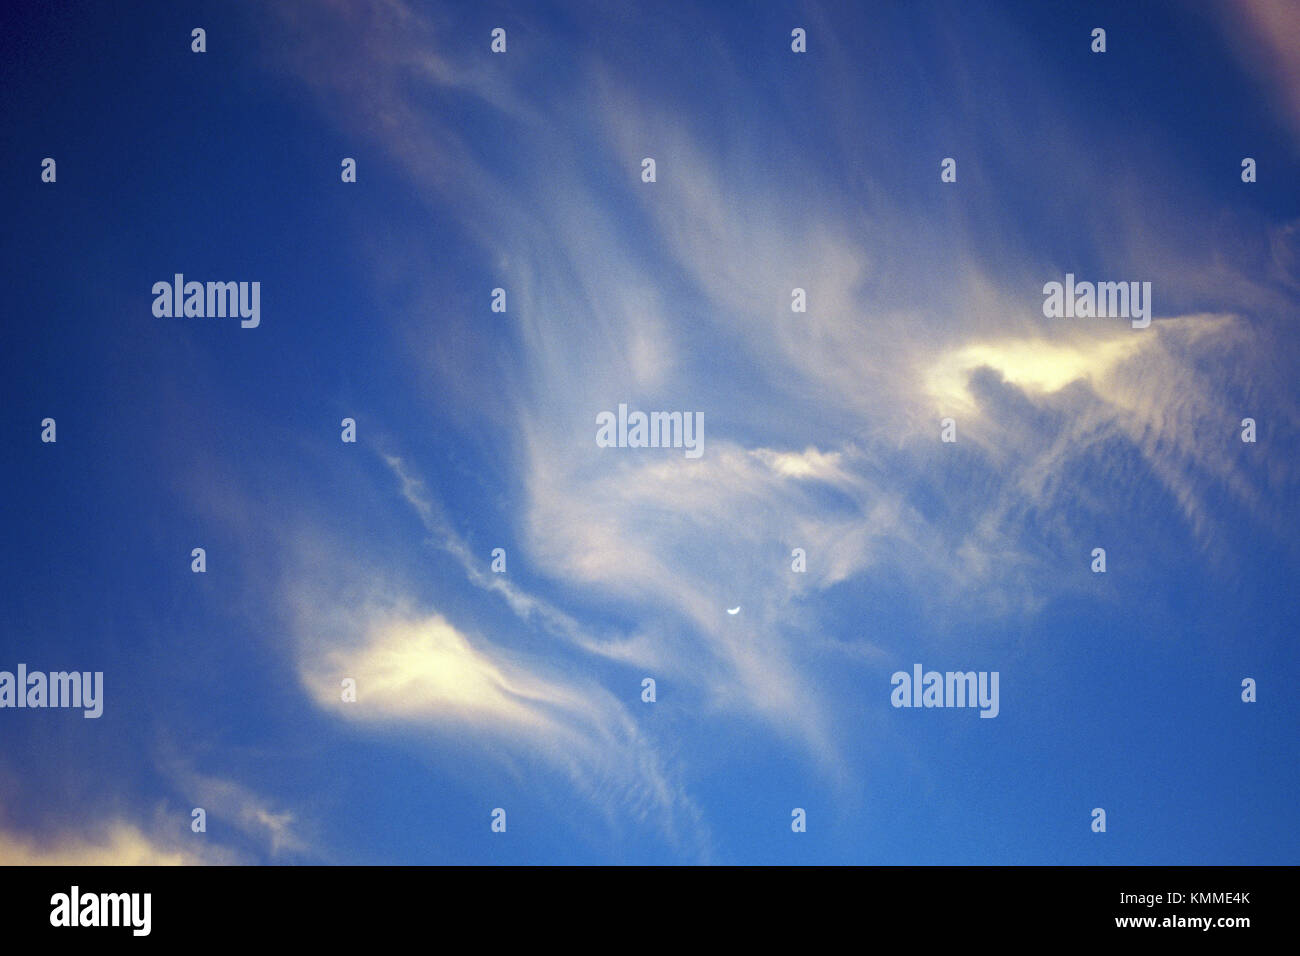 Wispy white clouds on blue sky. - Stock Image